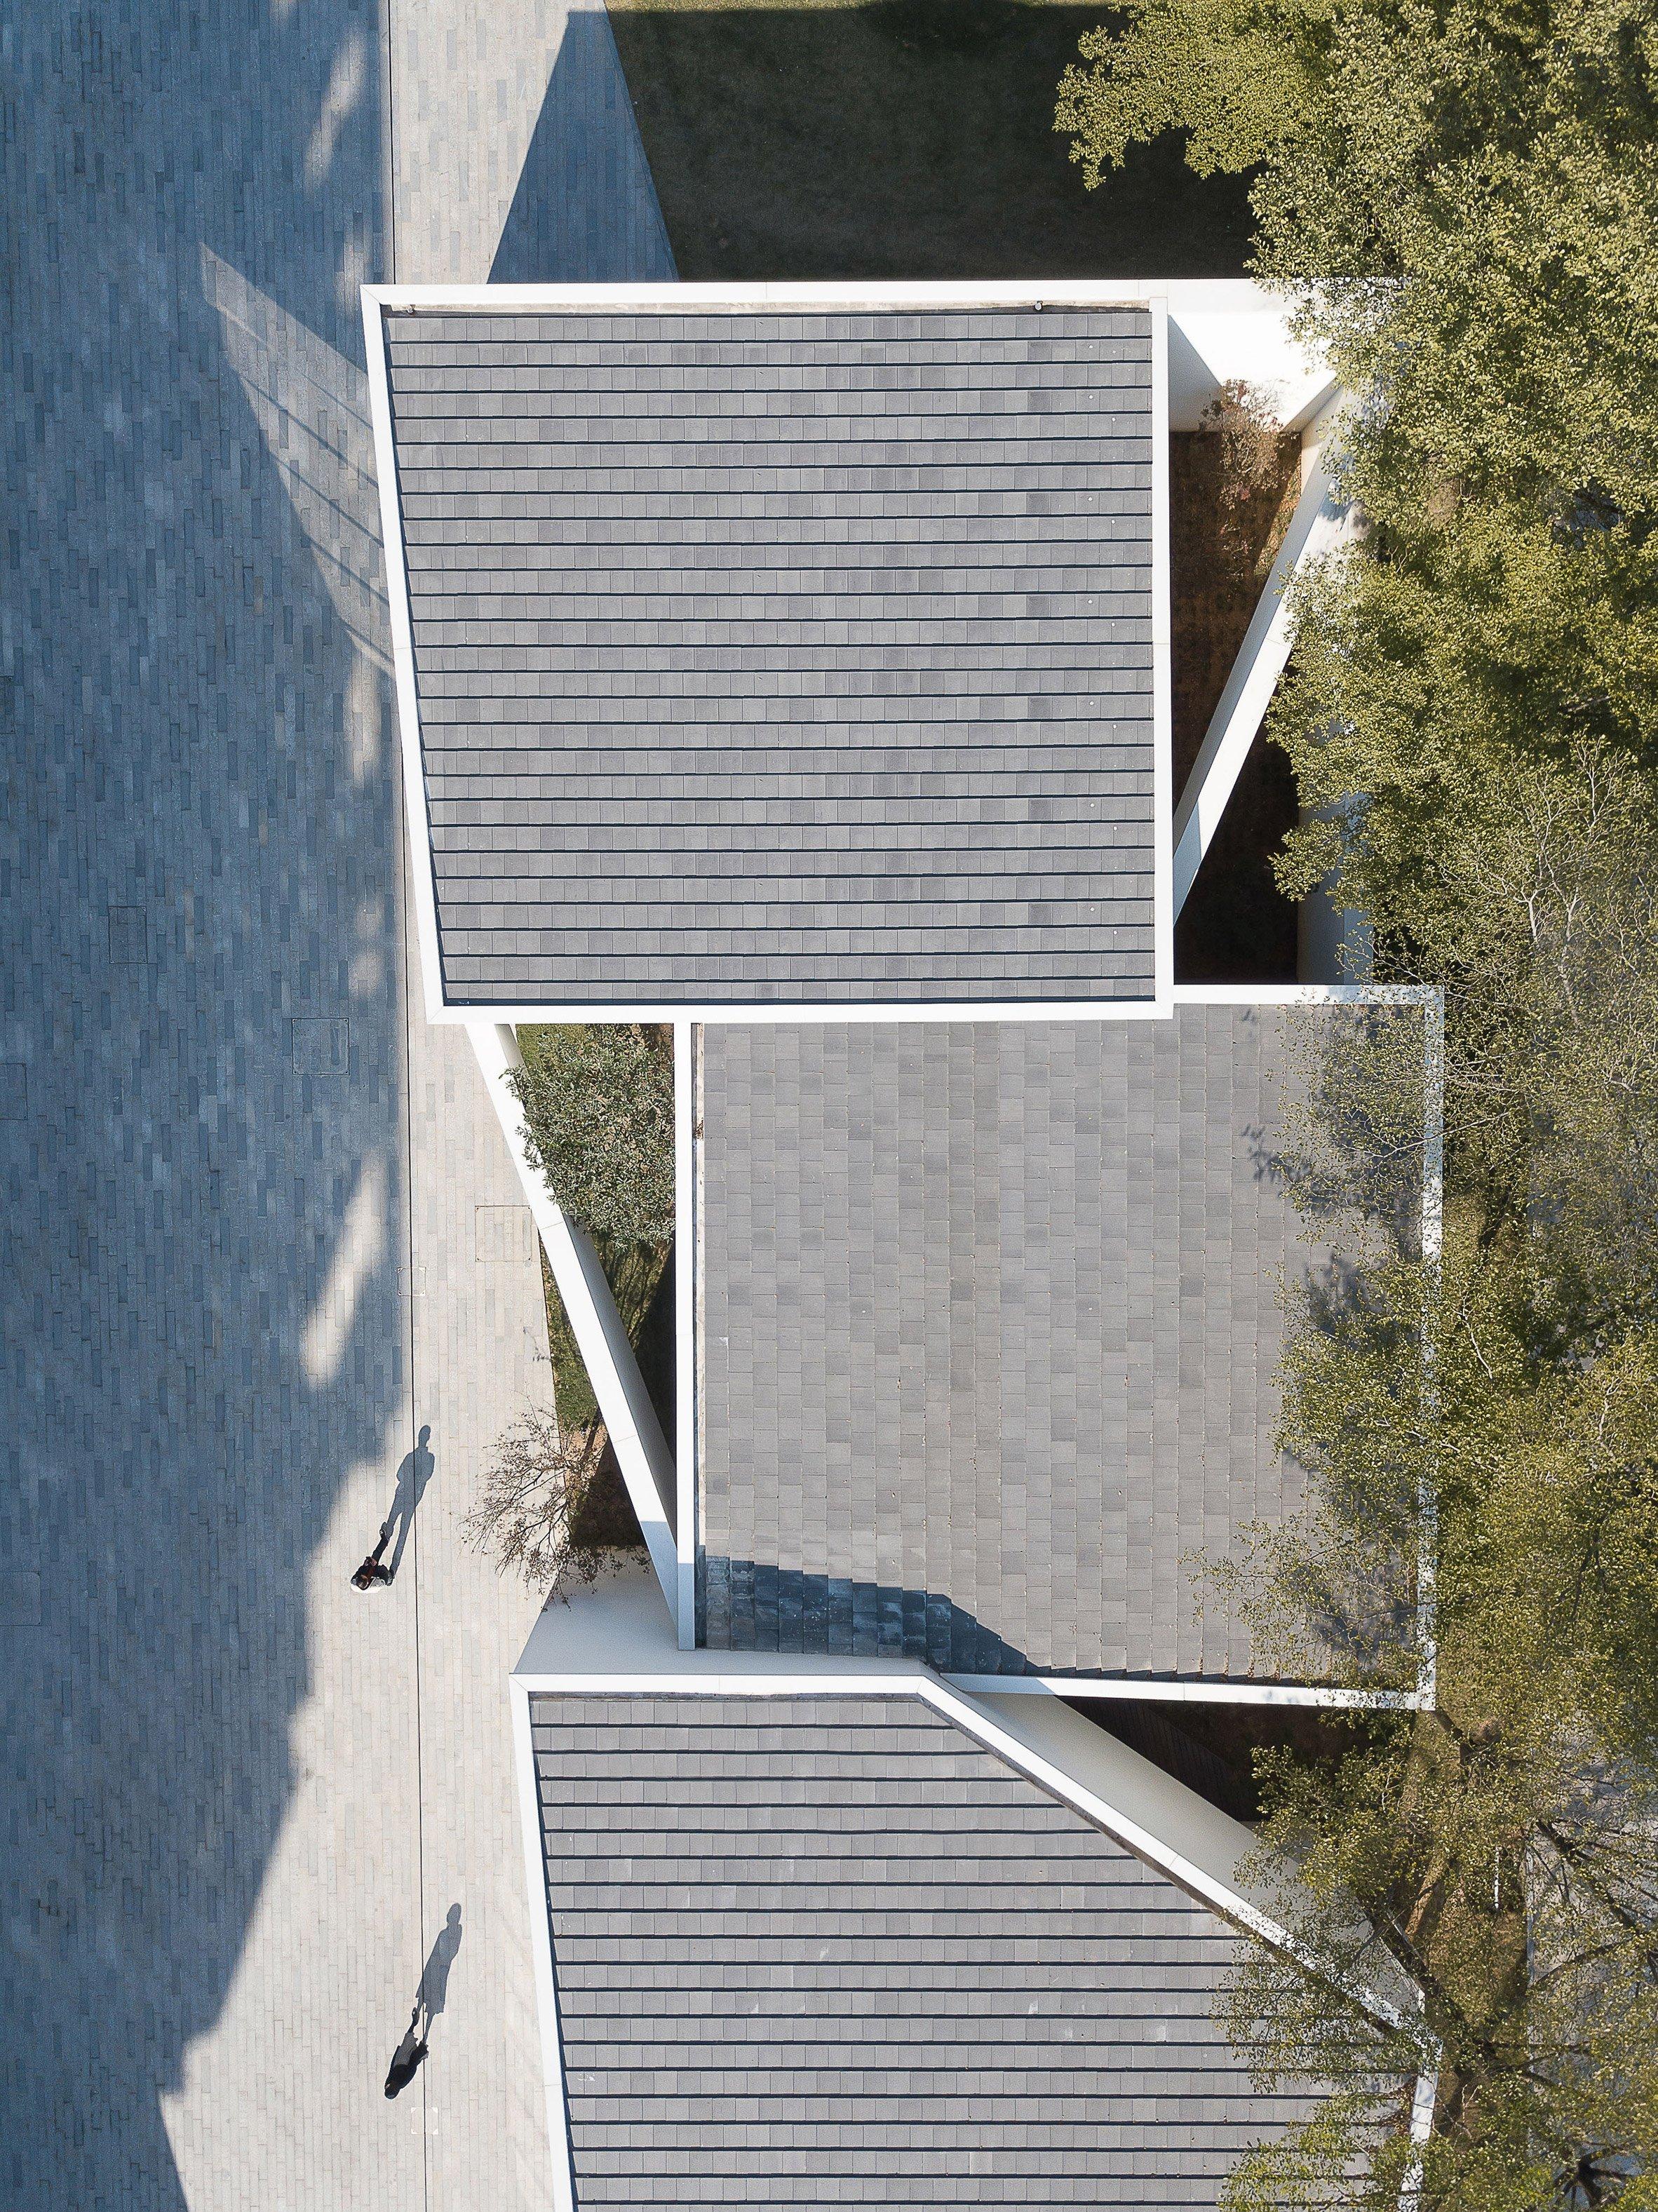 9cc597a5454fc Six interlocking concrete blocks form Living Art Pavilion in ...